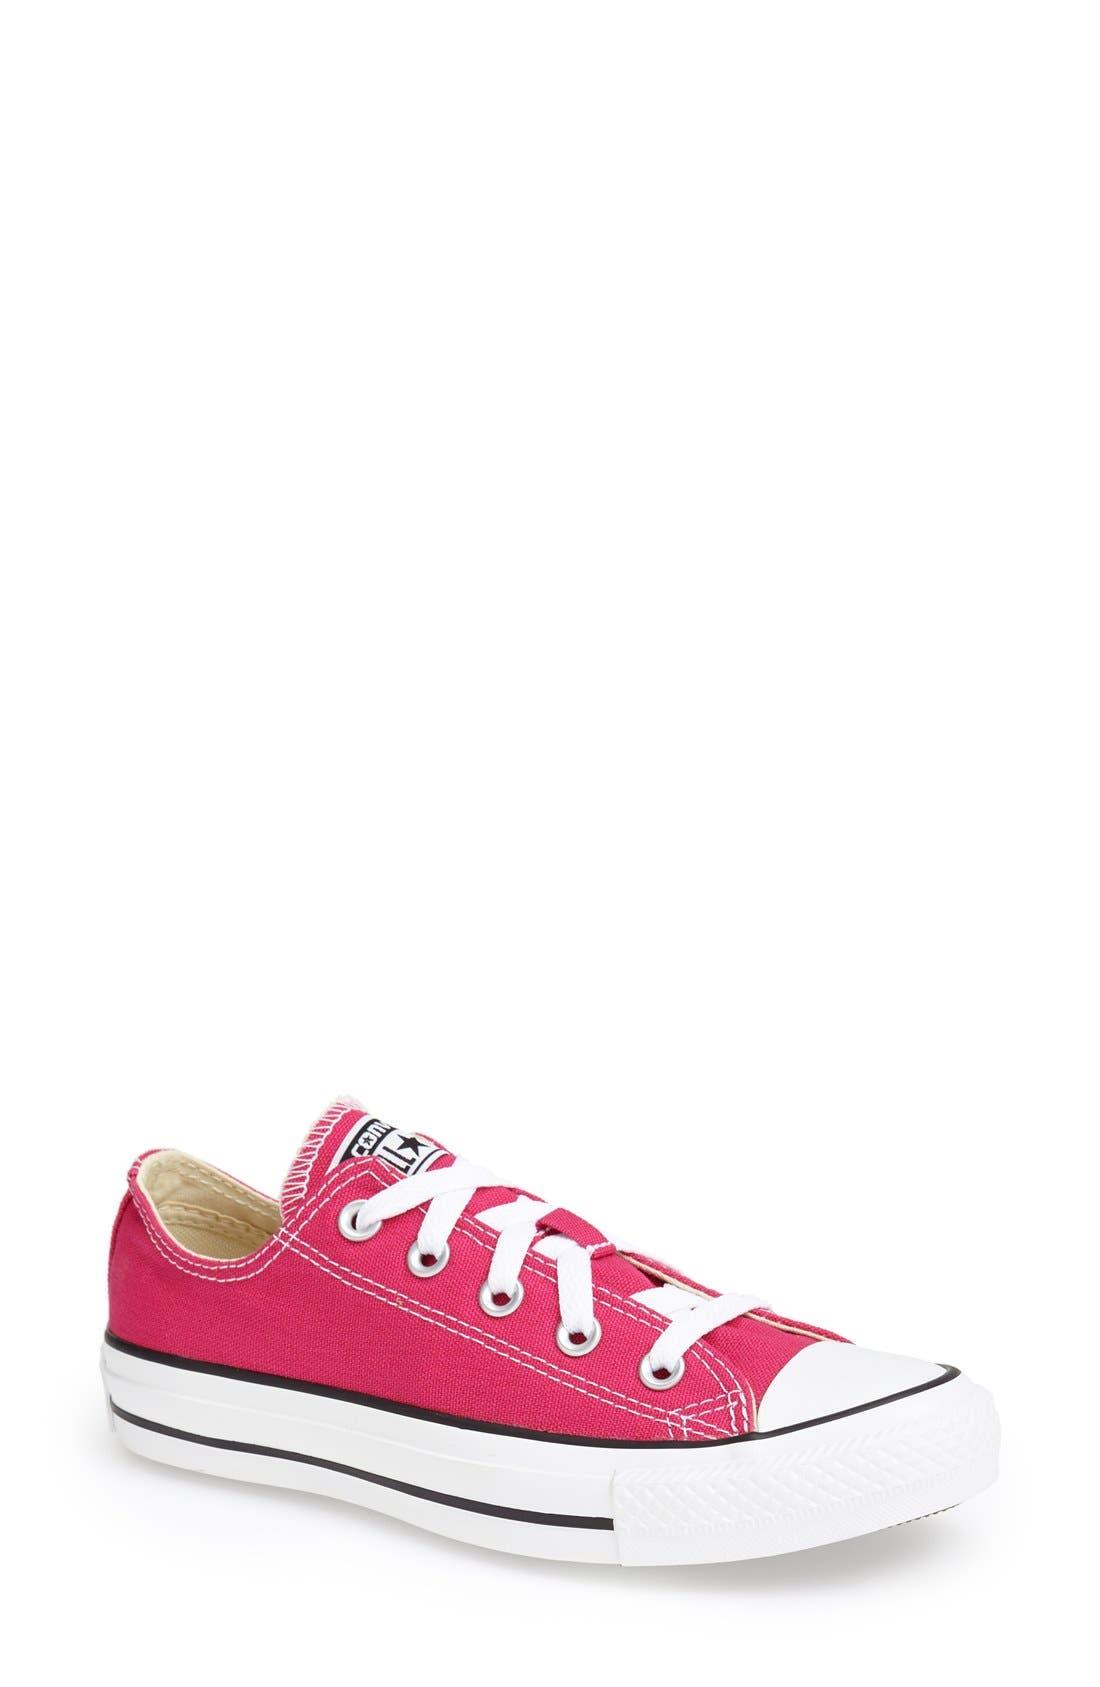 Main Image - Converse Chuck Taylor® All Star® 'Ox' Sneaker (Women)